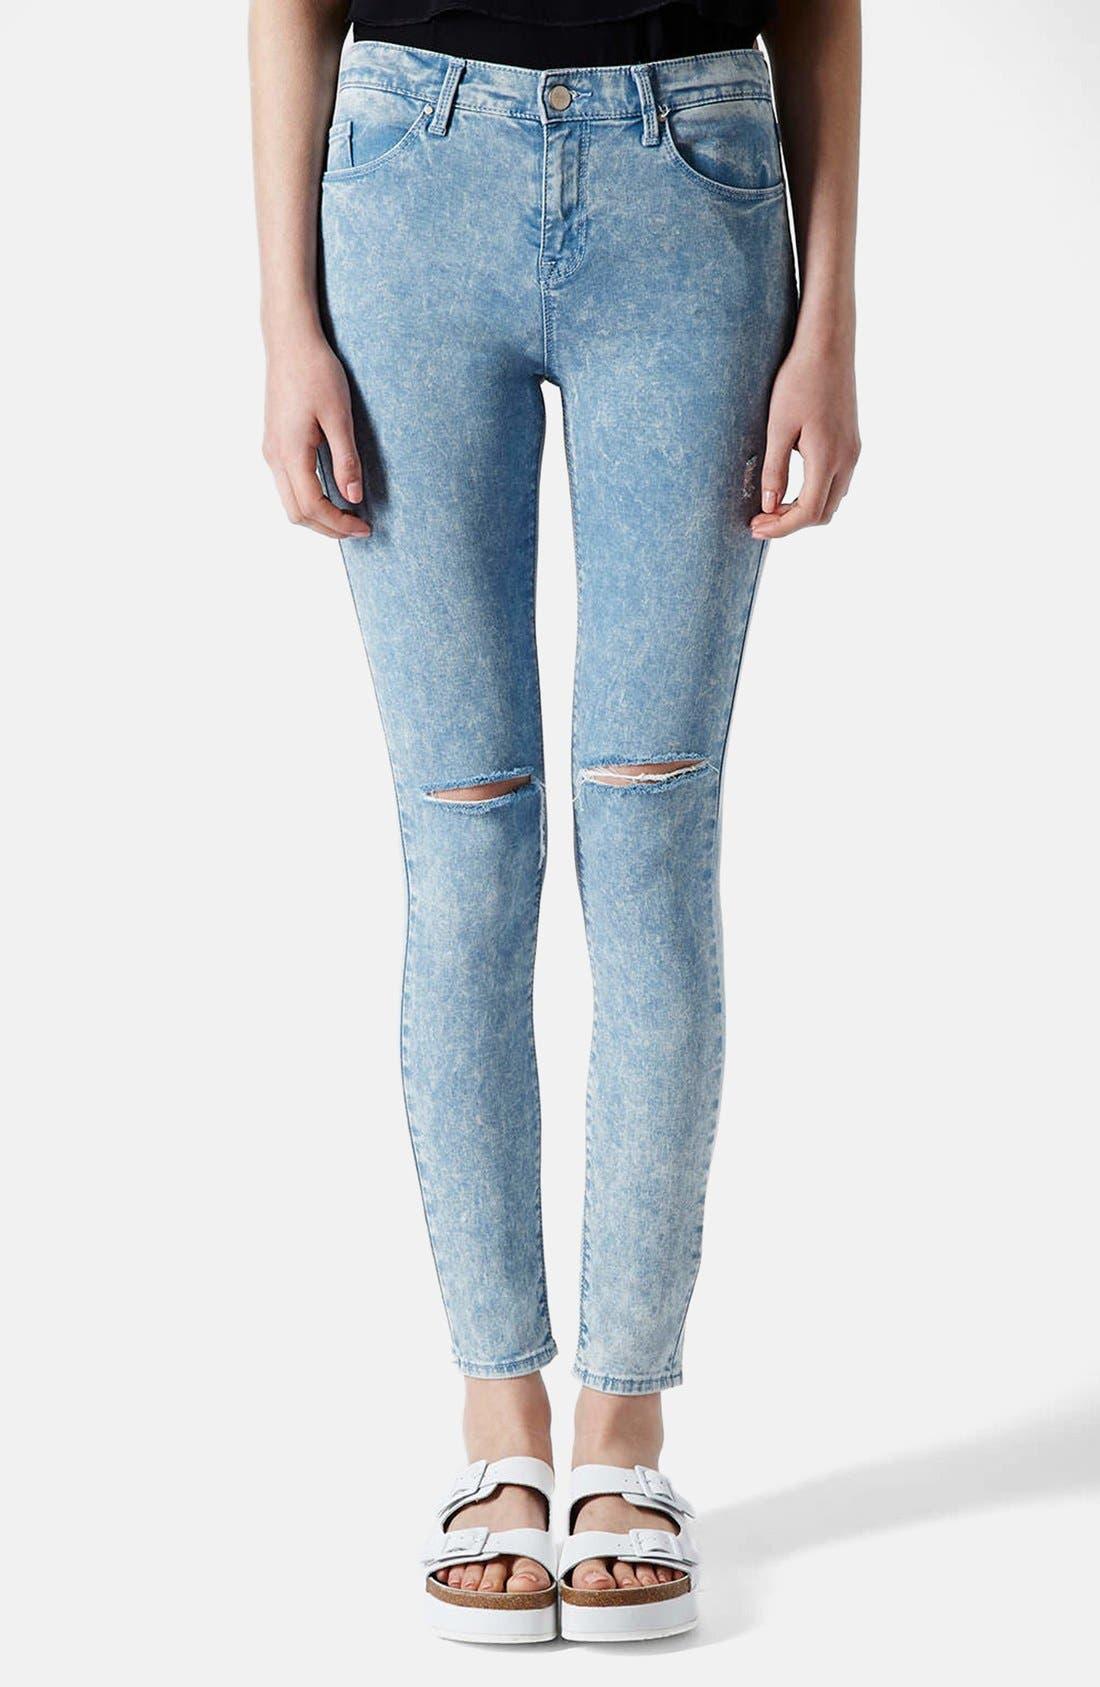 Alternate Image 1 Selected - Topshop Moto 'Leigh' Acid Wash Ripped Skinny Jeans (Light Blue) (Regular & Short)